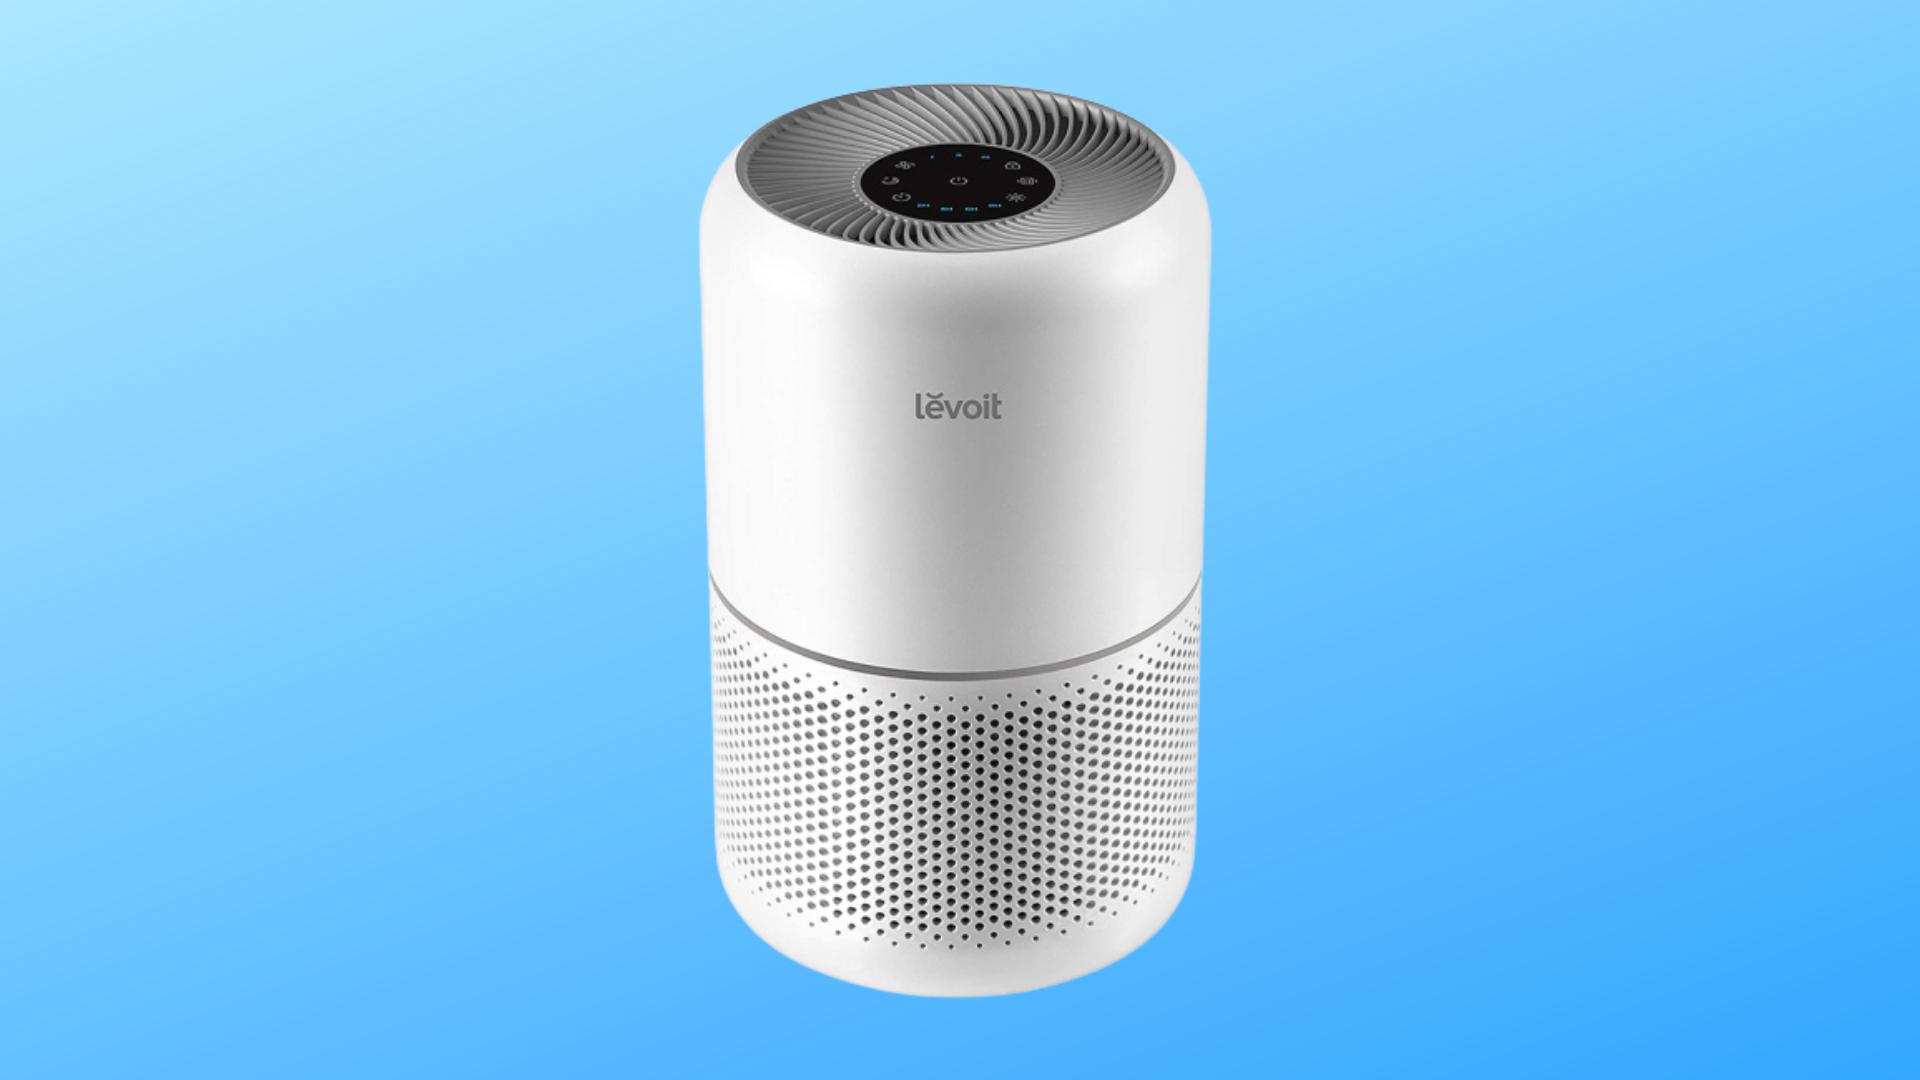 levoit-air-purifier-product